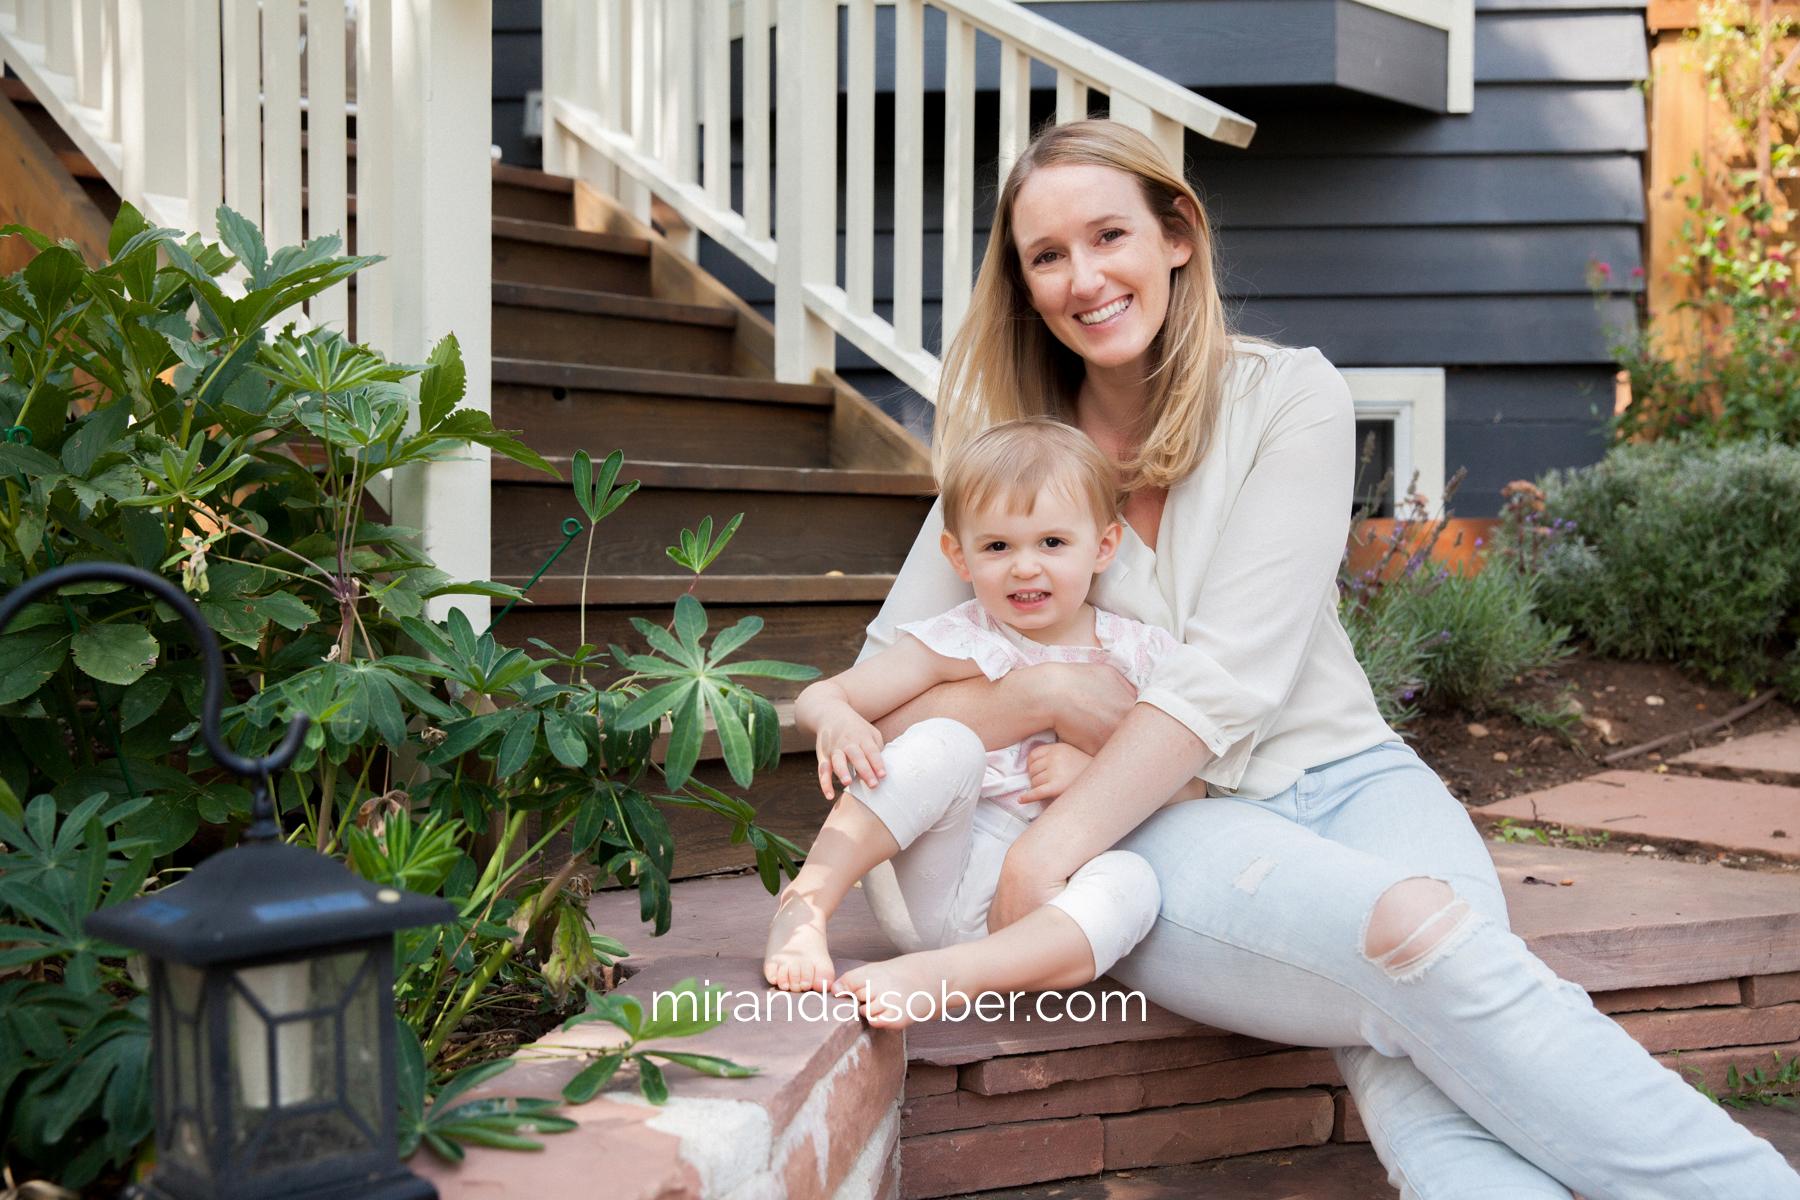 Best Boulder Baby Photographers, Miranda L. Sober Photography, Boulder & Denver baby photographer